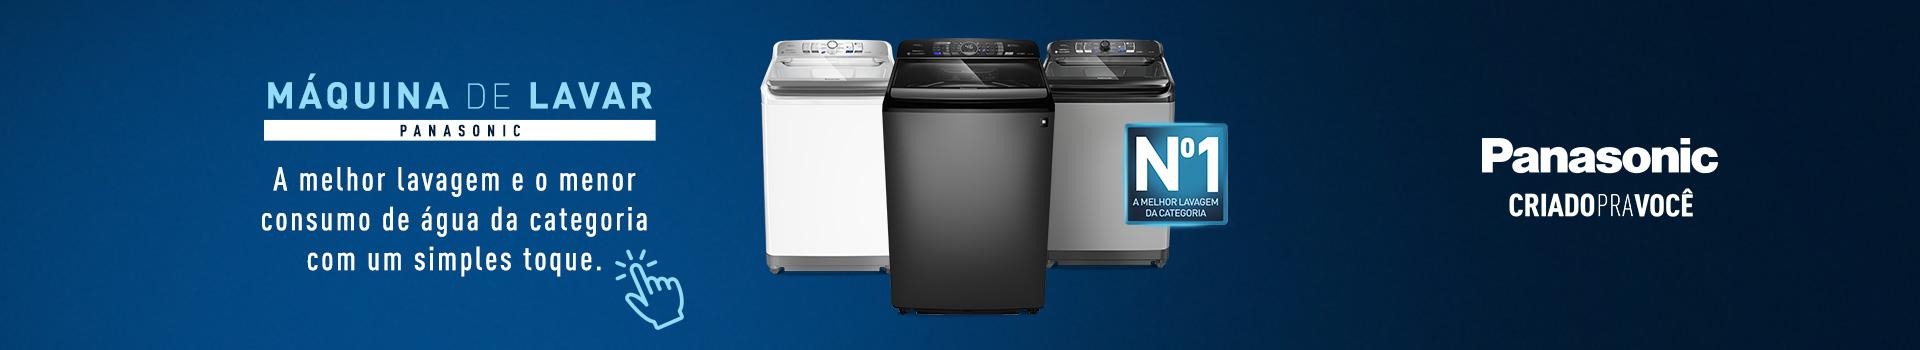 Máquina de Lavar - Panasonic